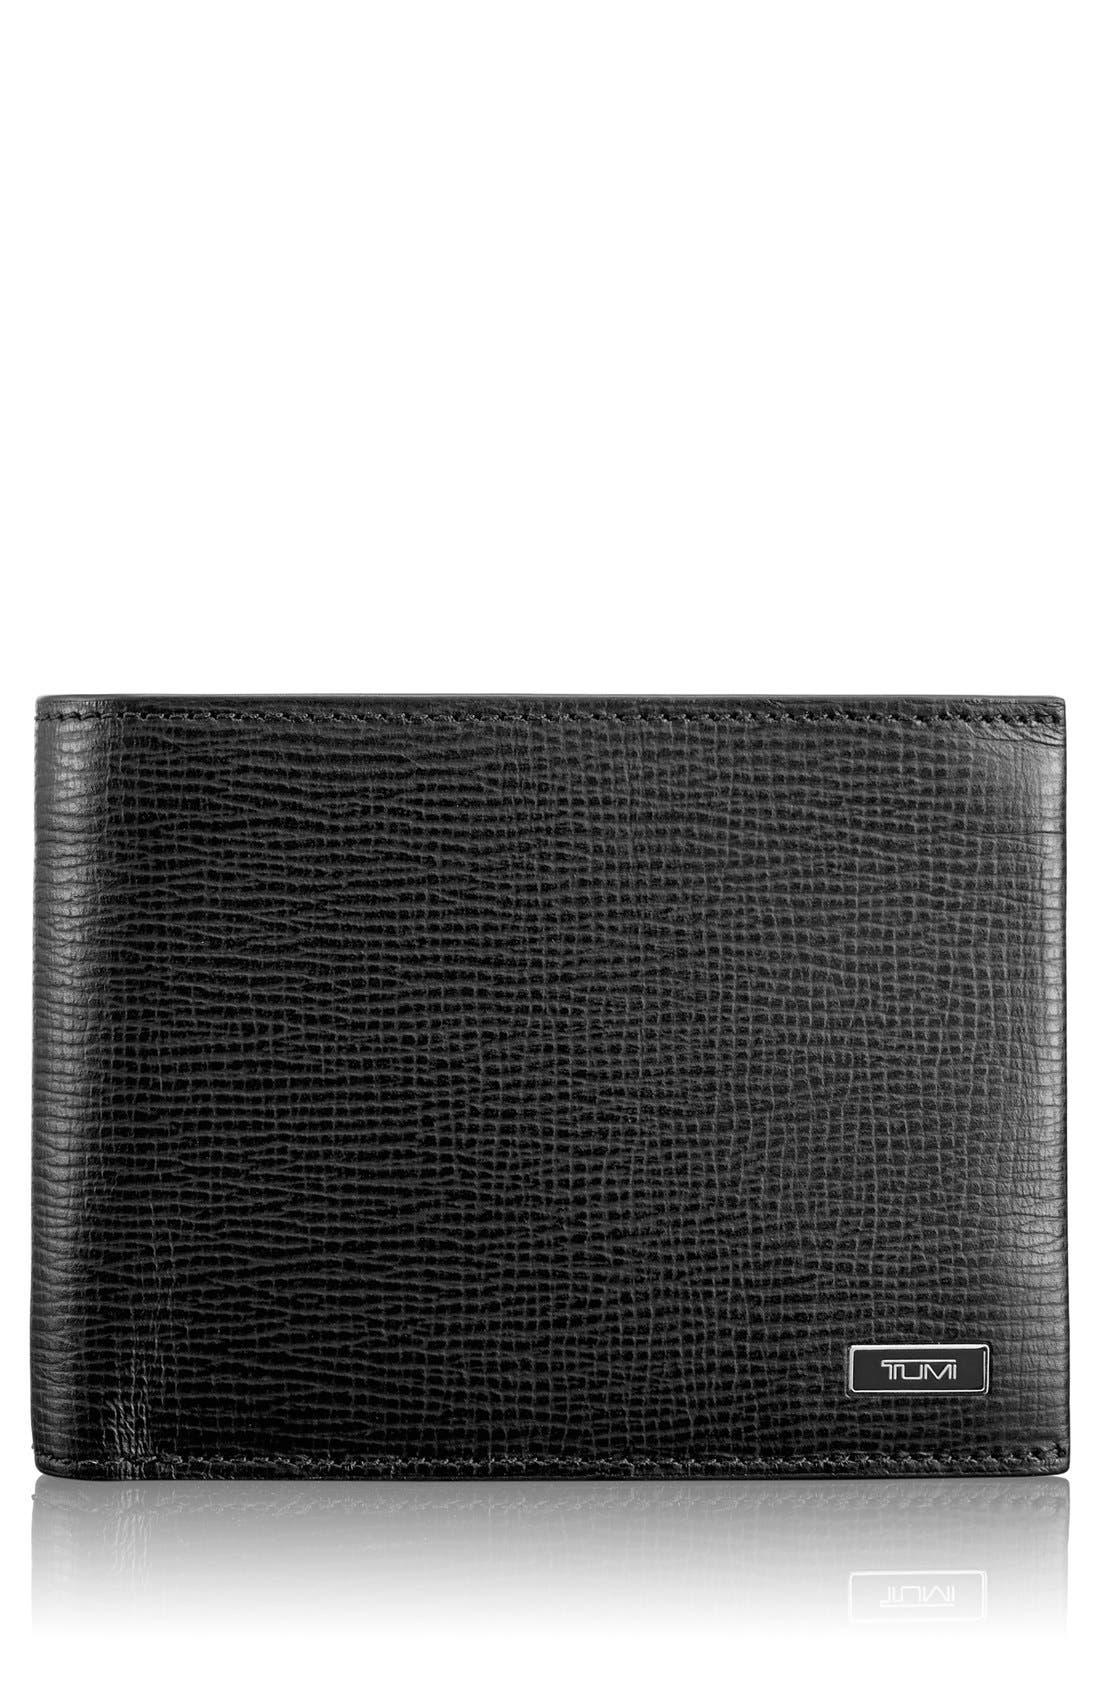 Tumi Monaco Global Double Billfold Leather Wallet